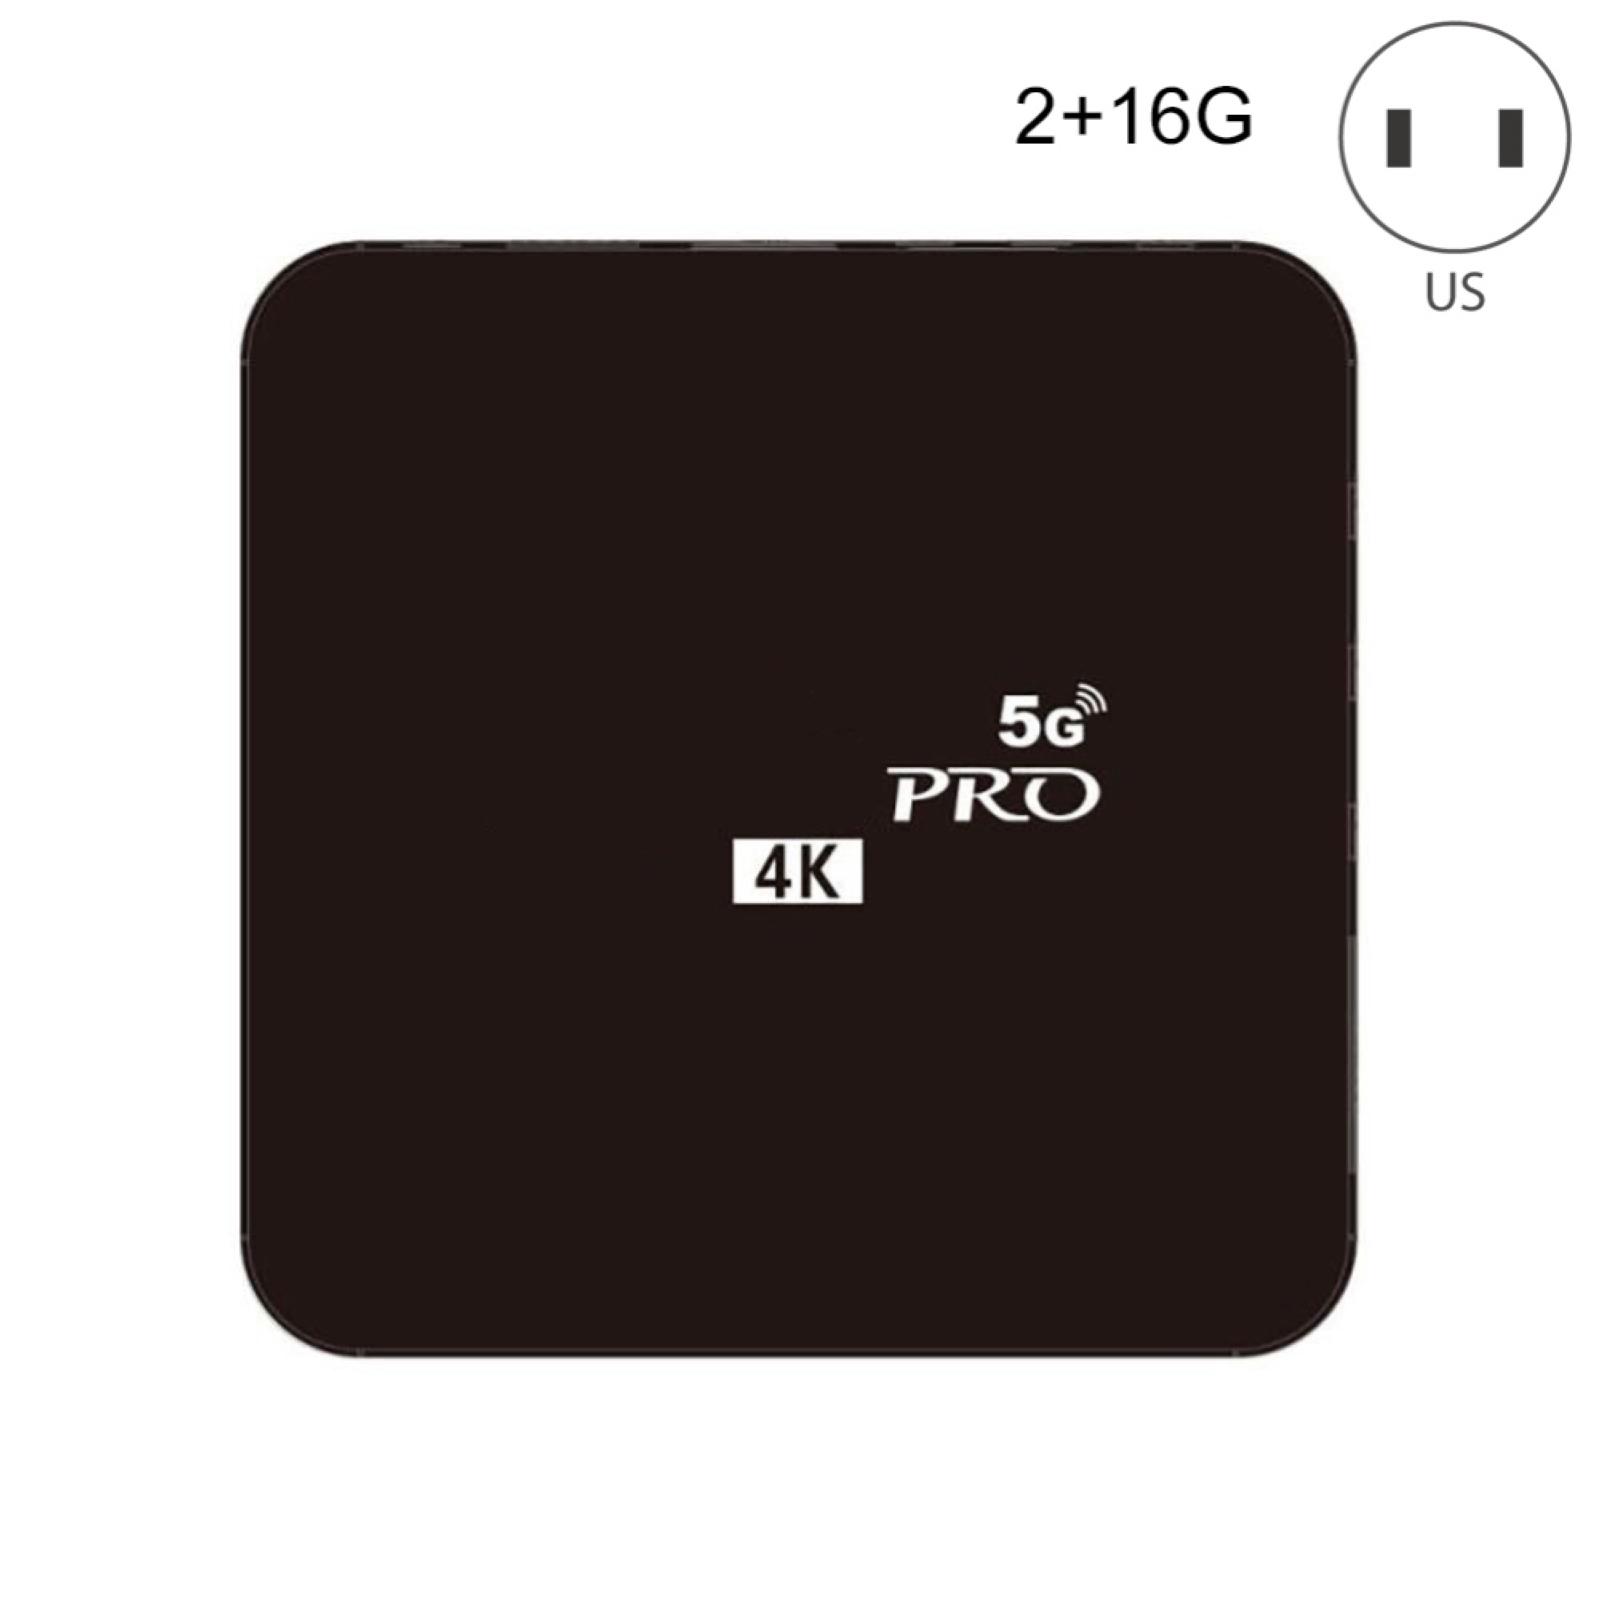 miniatura 14 - 2020 pulgadas Android 10.1 V88 TV Box 5G Wifi 4K Quad Core Smart Media Player 2+16g 1+8g